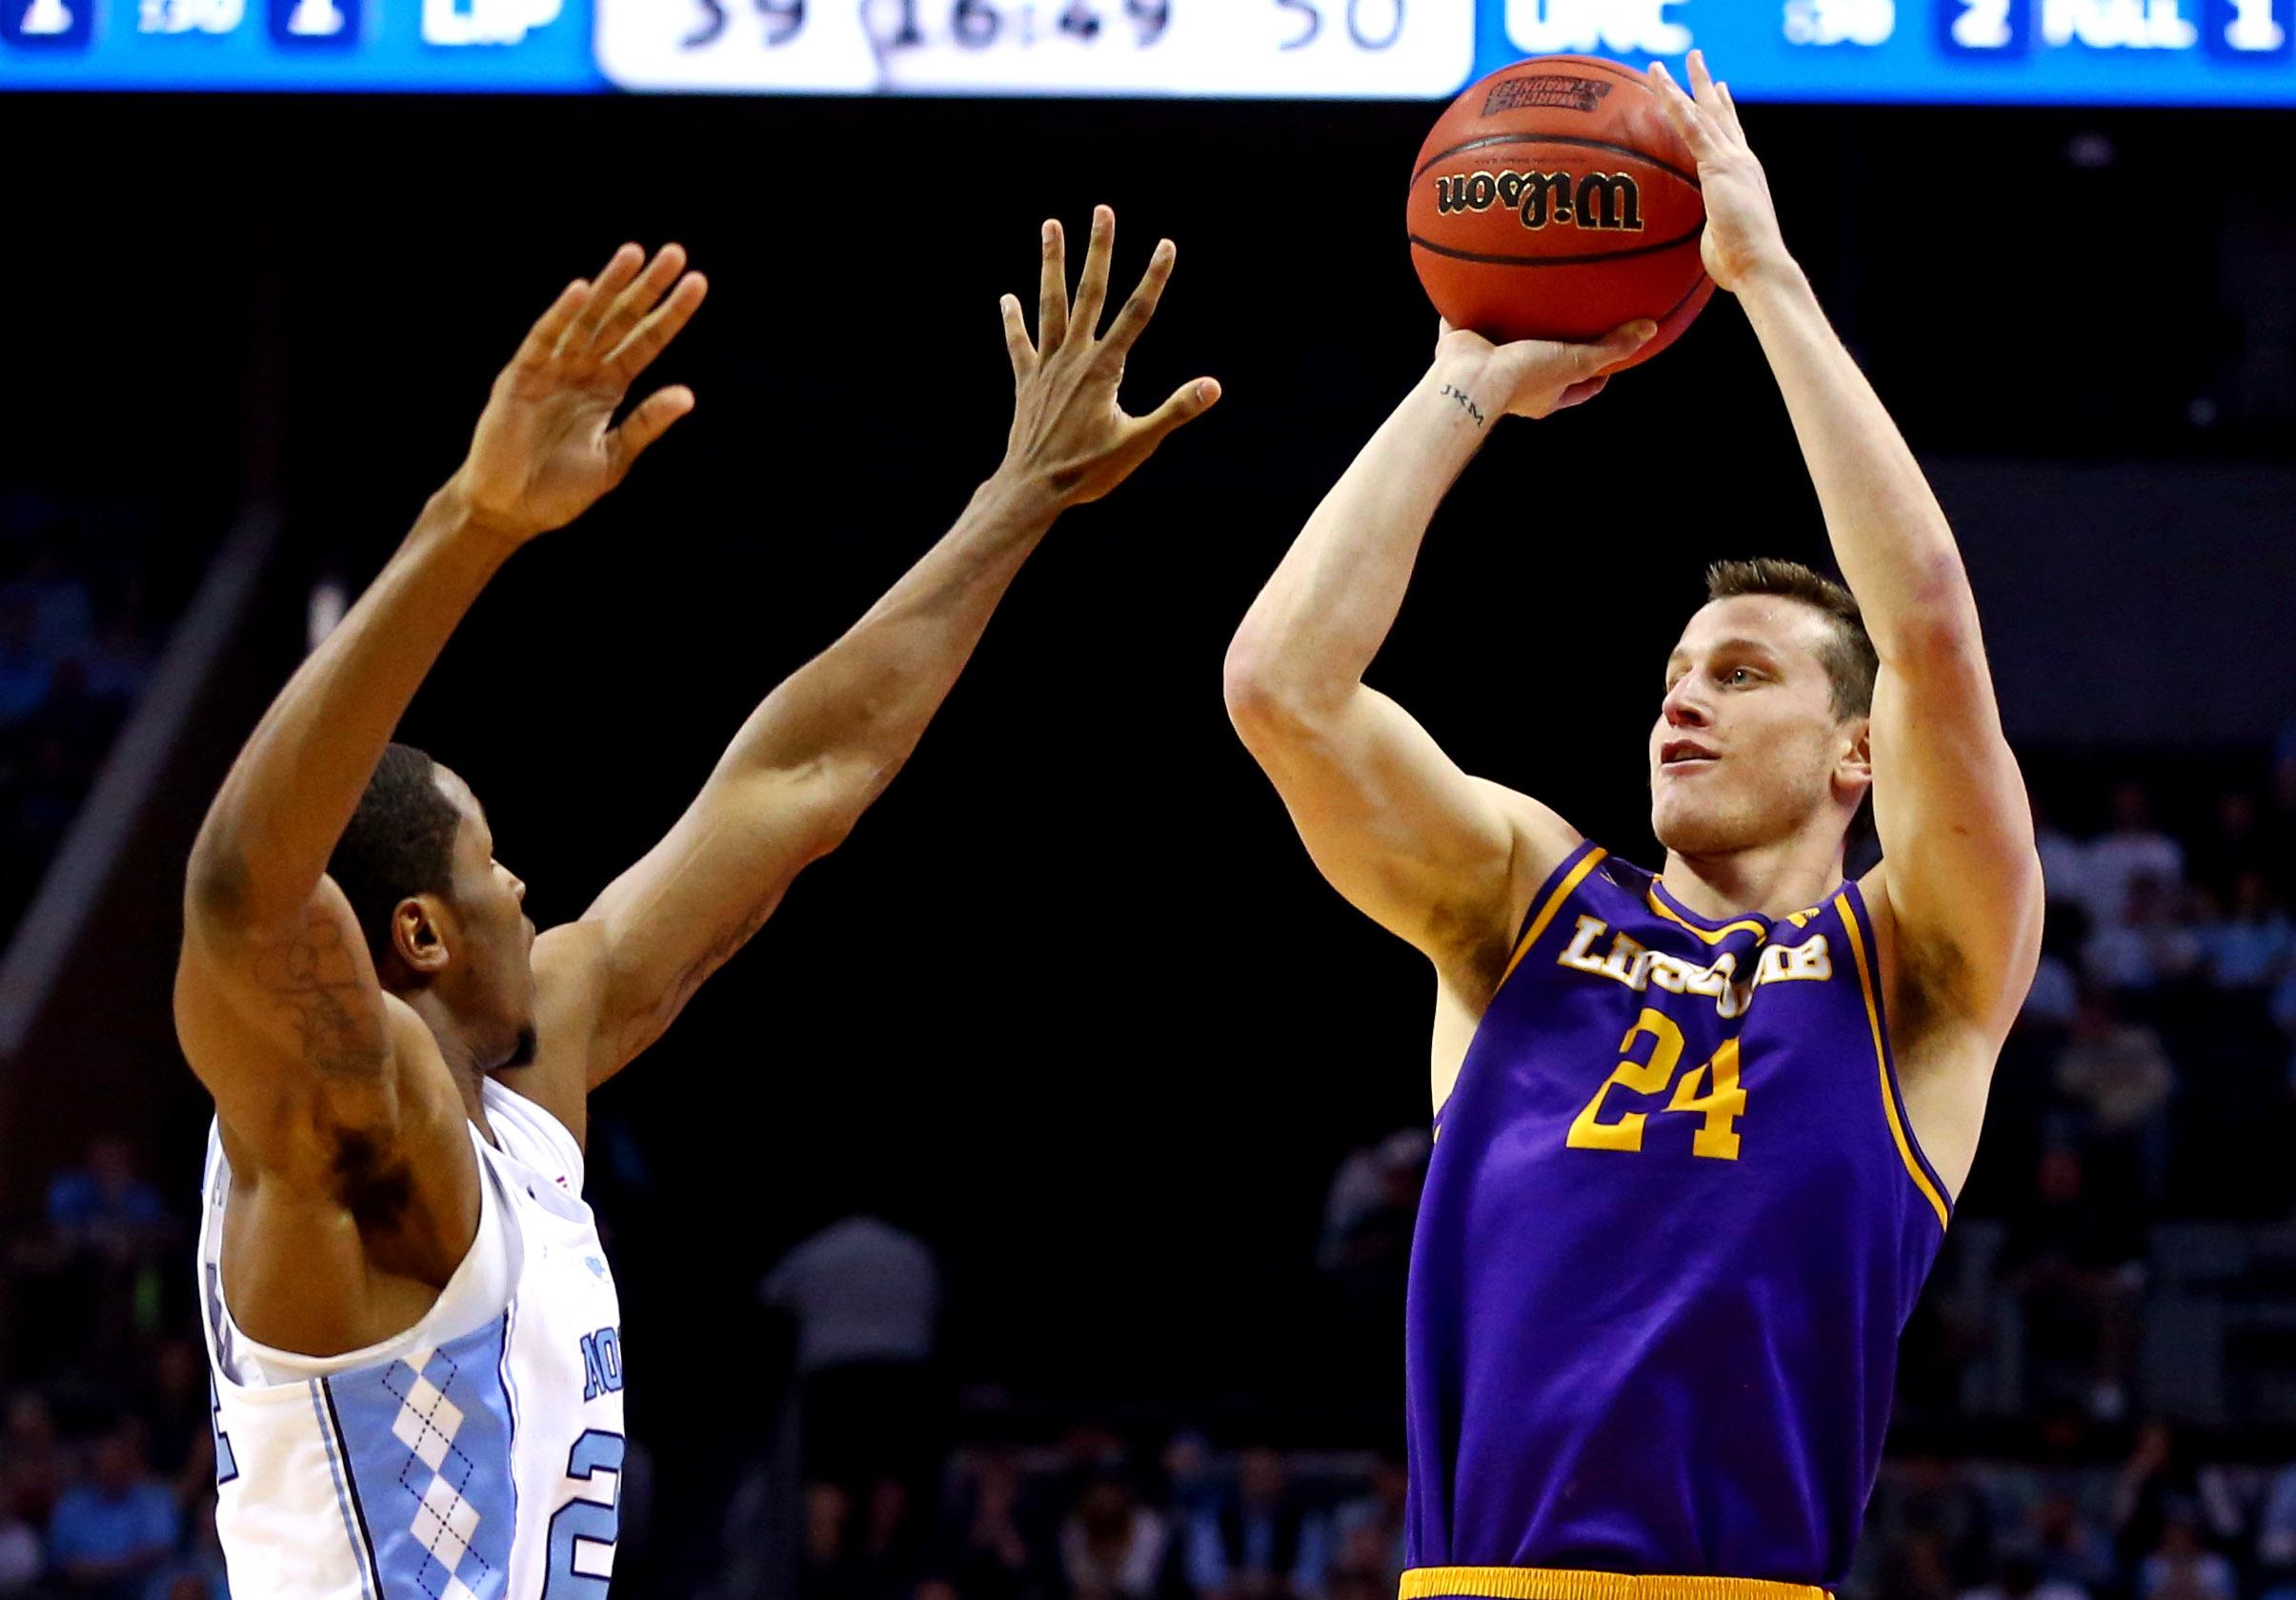 NCAA Basketball: NCAA Tournament-First Round-North Carolina vs Lipscomb